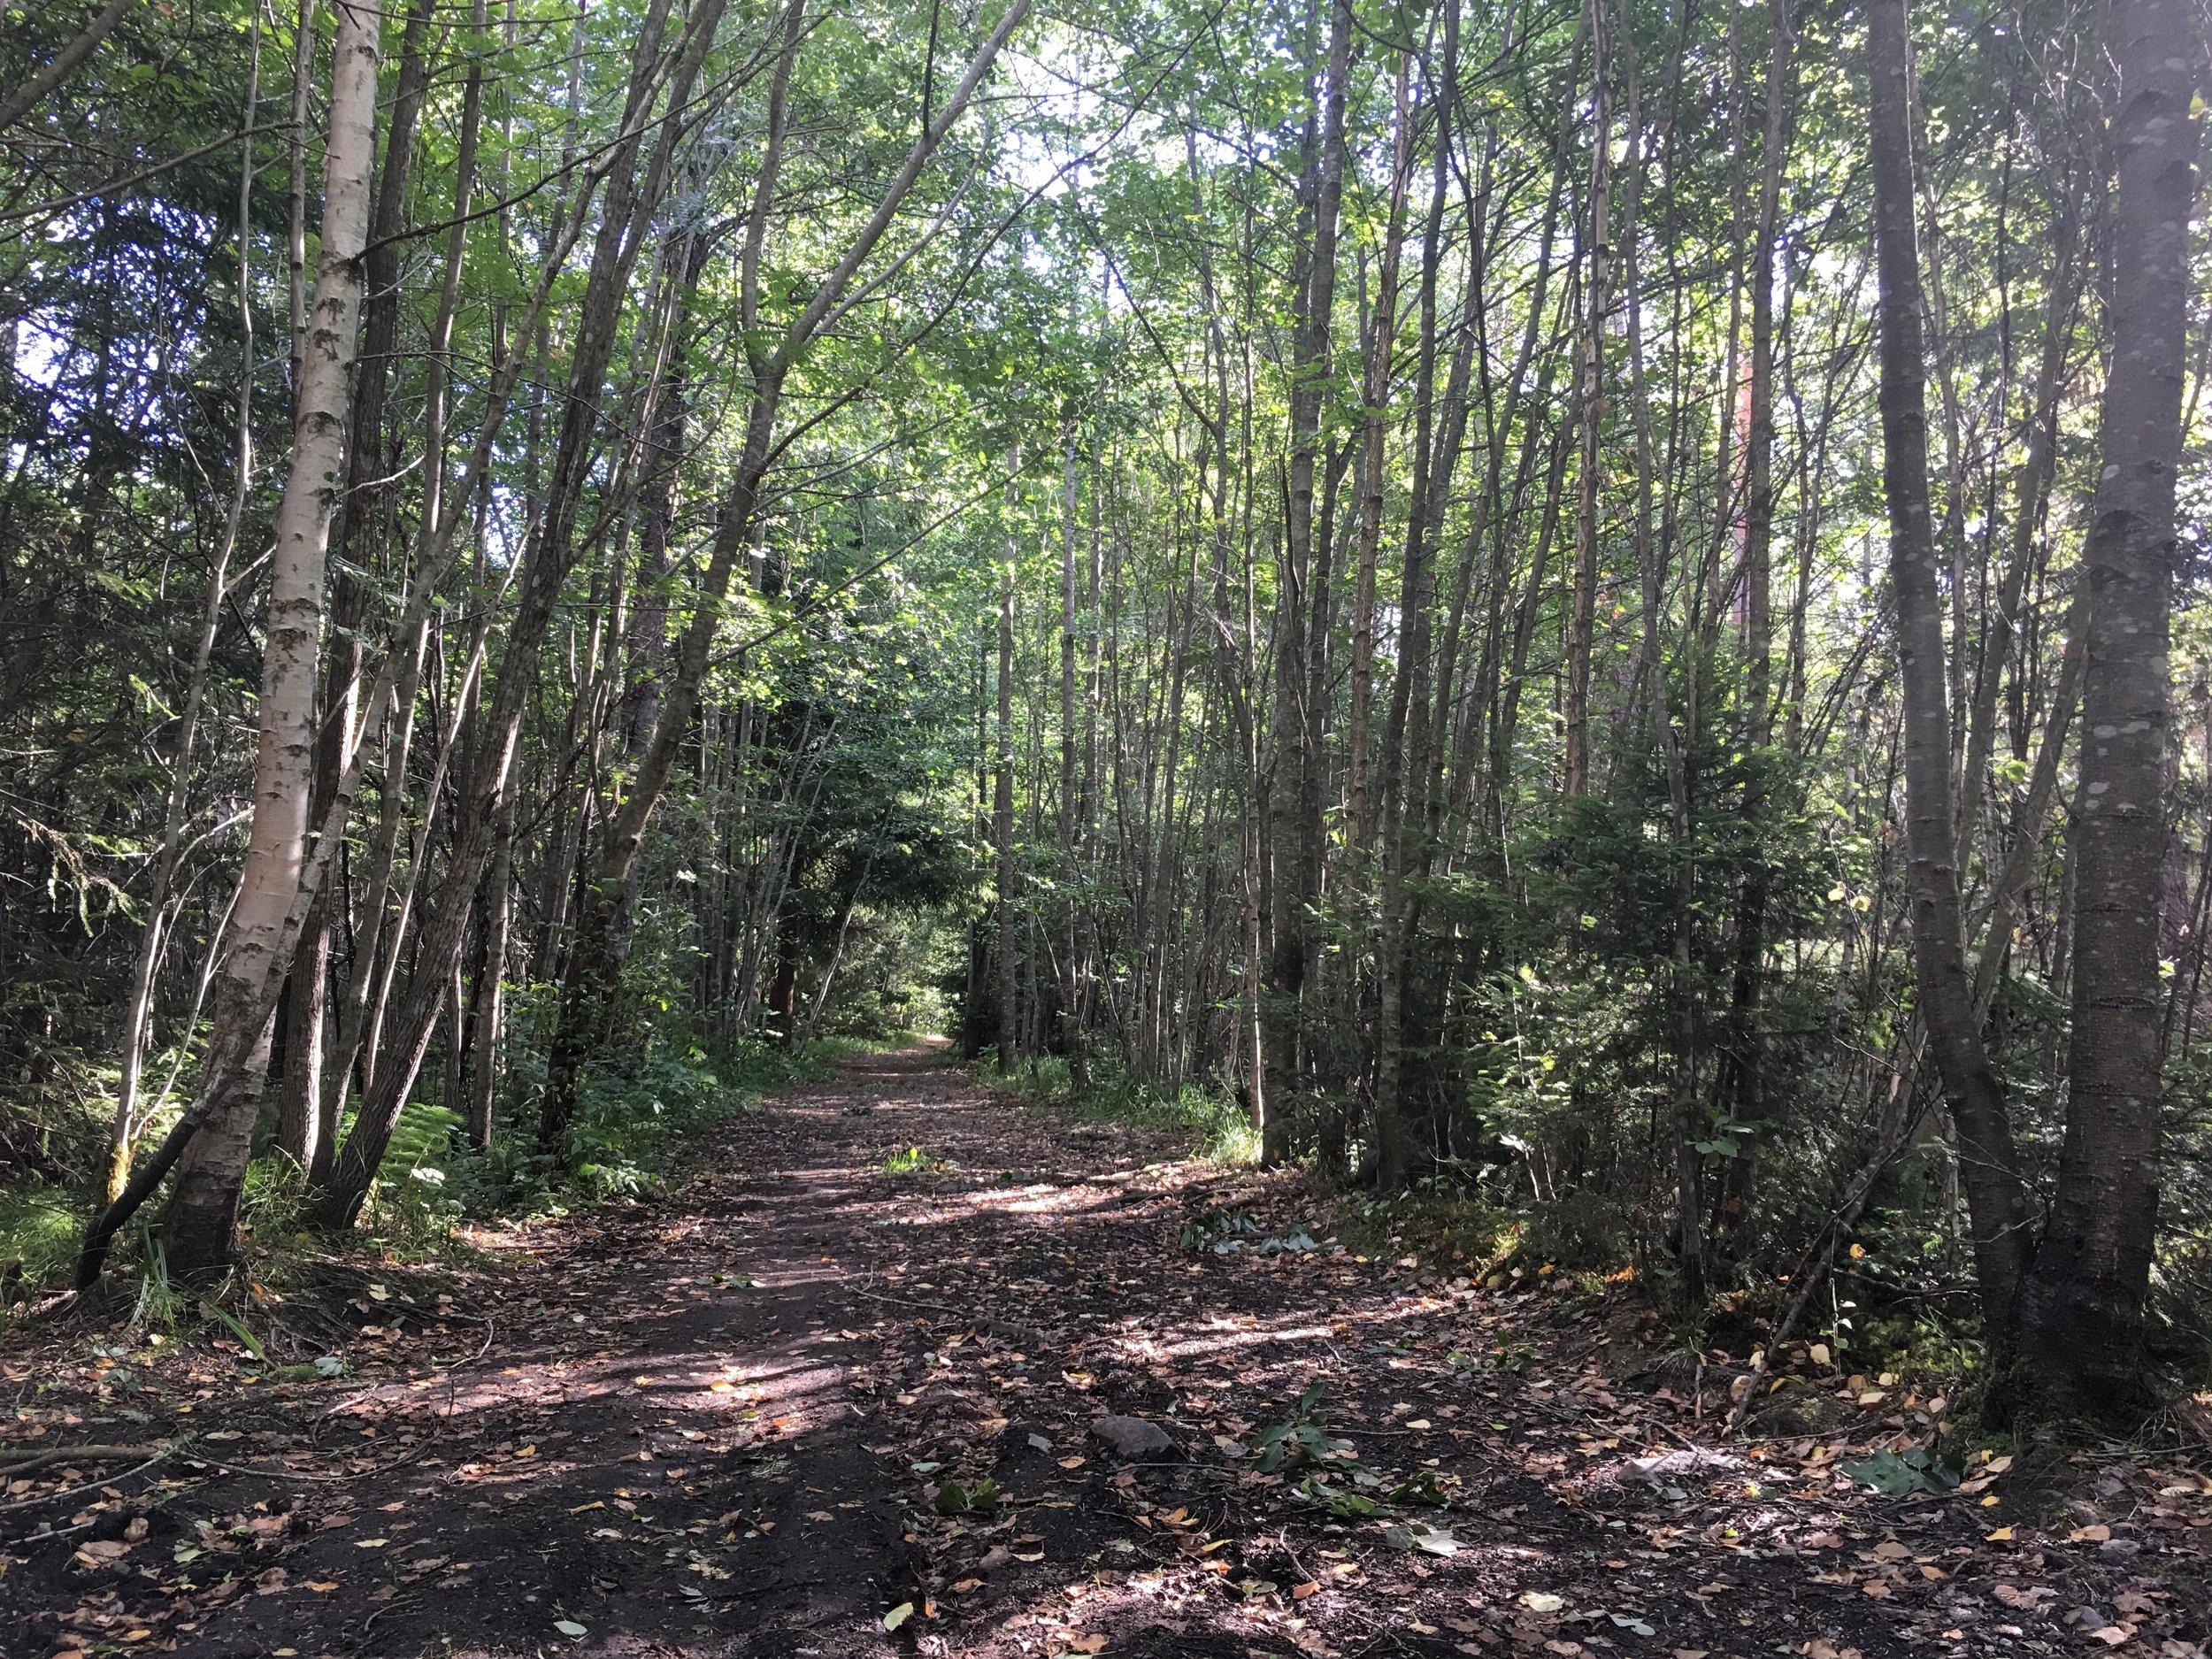 Kongeveien på Mosseskogen en augustdag 2018